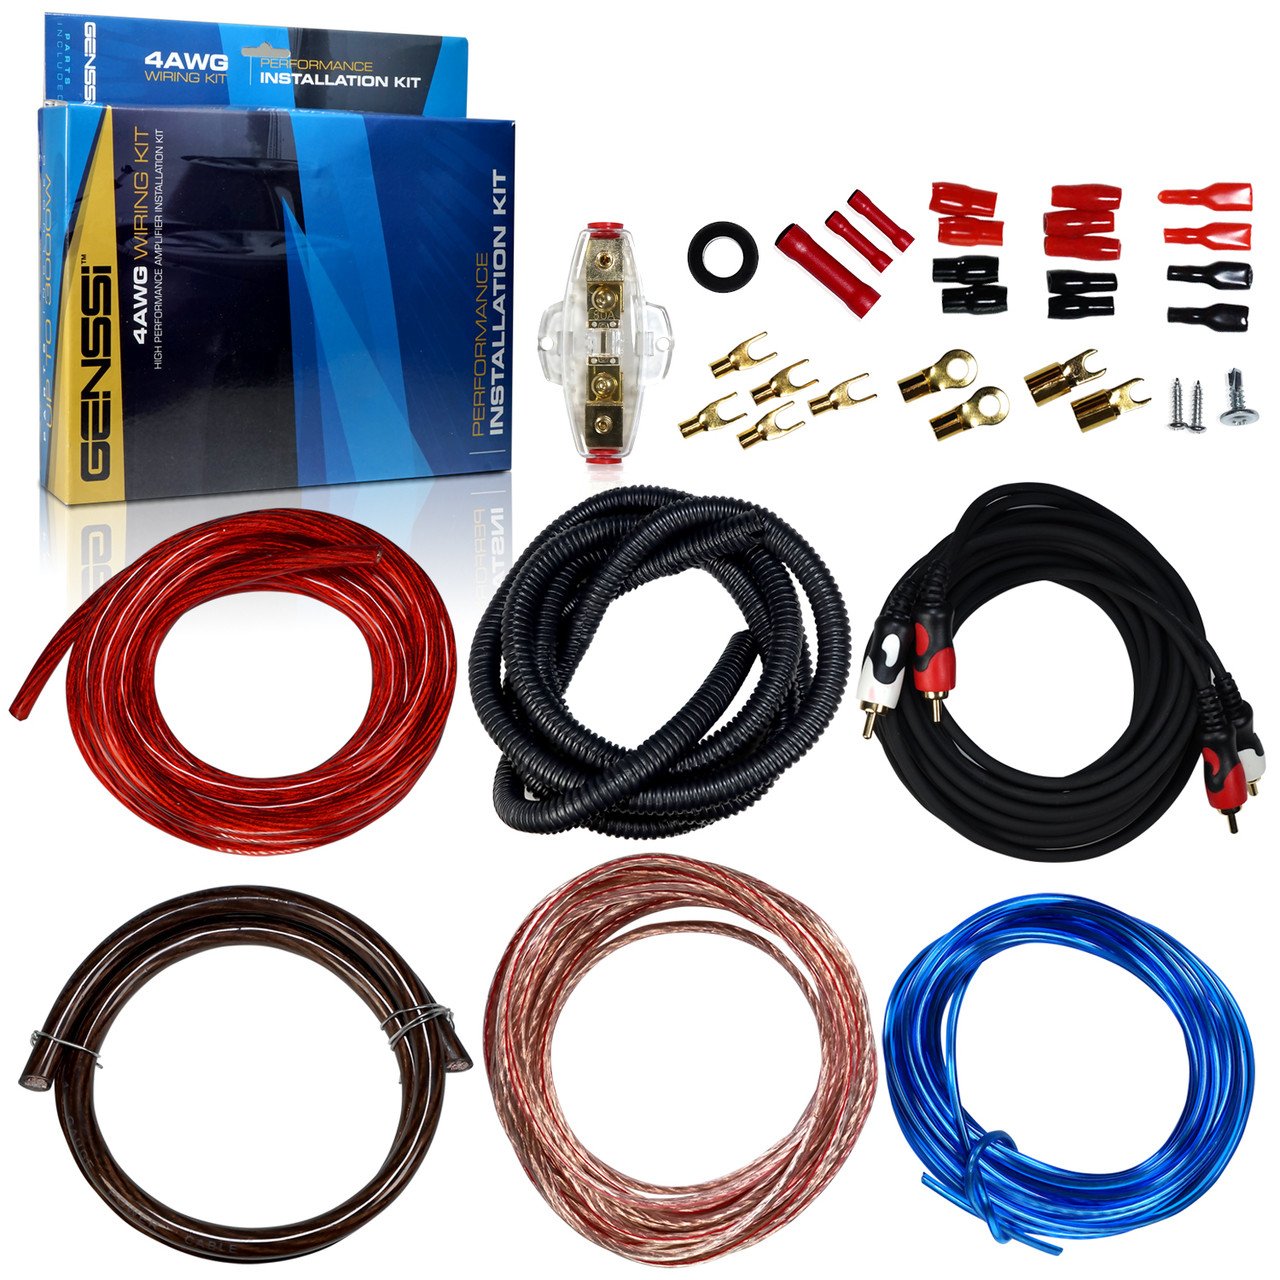 4awg car audio installation wiring kit 4 gauge genssi 4 gauge wiring kit car audio [ 1280 x 1280 Pixel ]